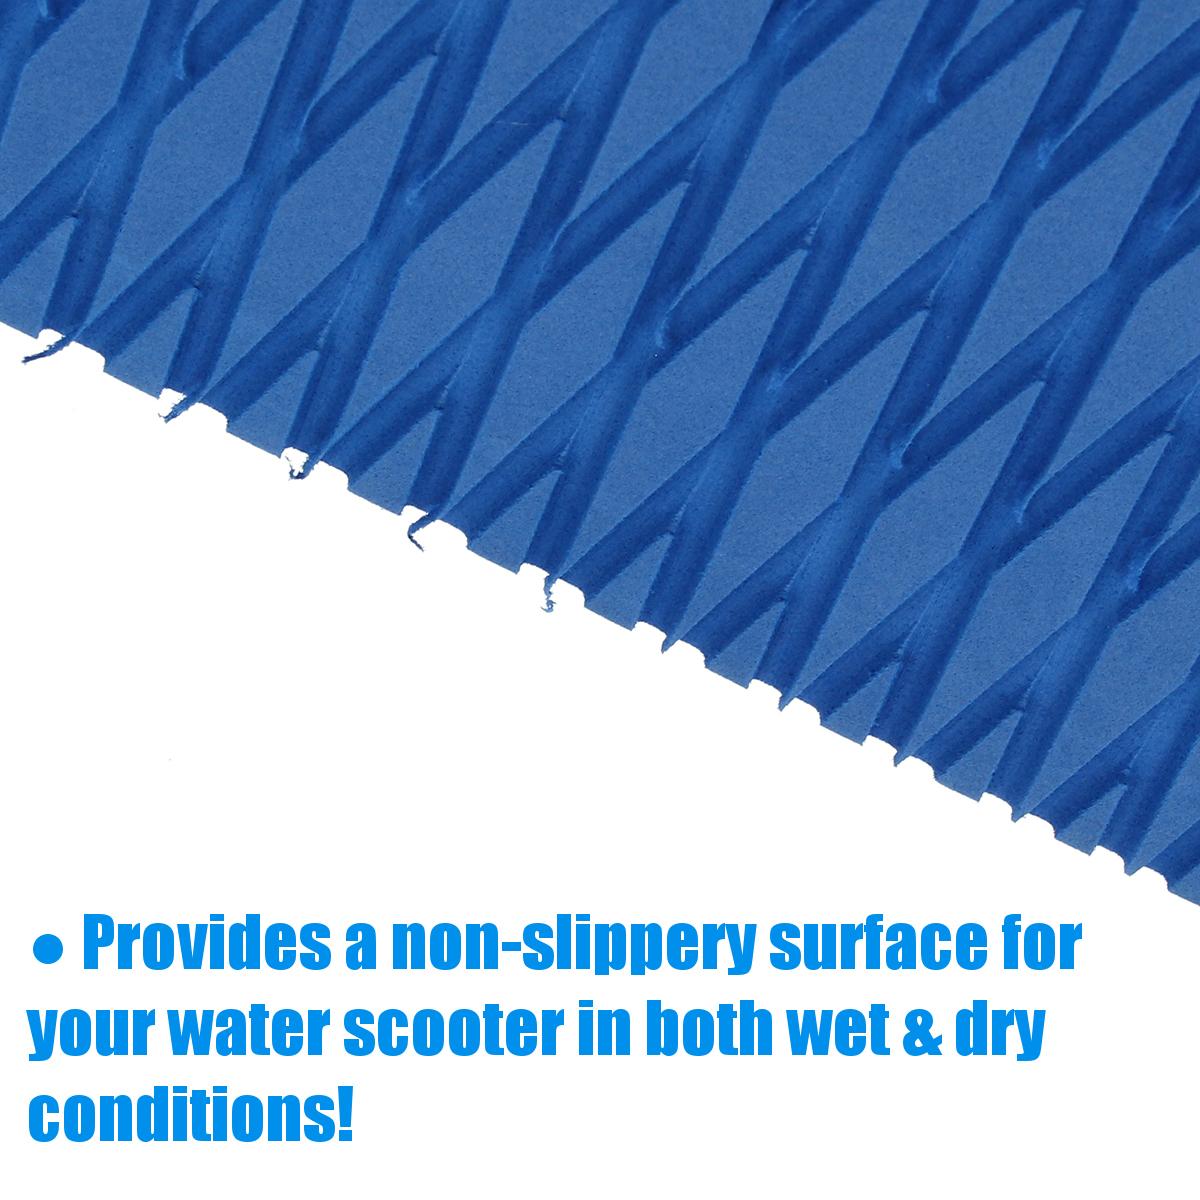 5mm Water Scooter Non-skid Marine Floor EVA Foam Decking Boat Sheet Carpet Blue